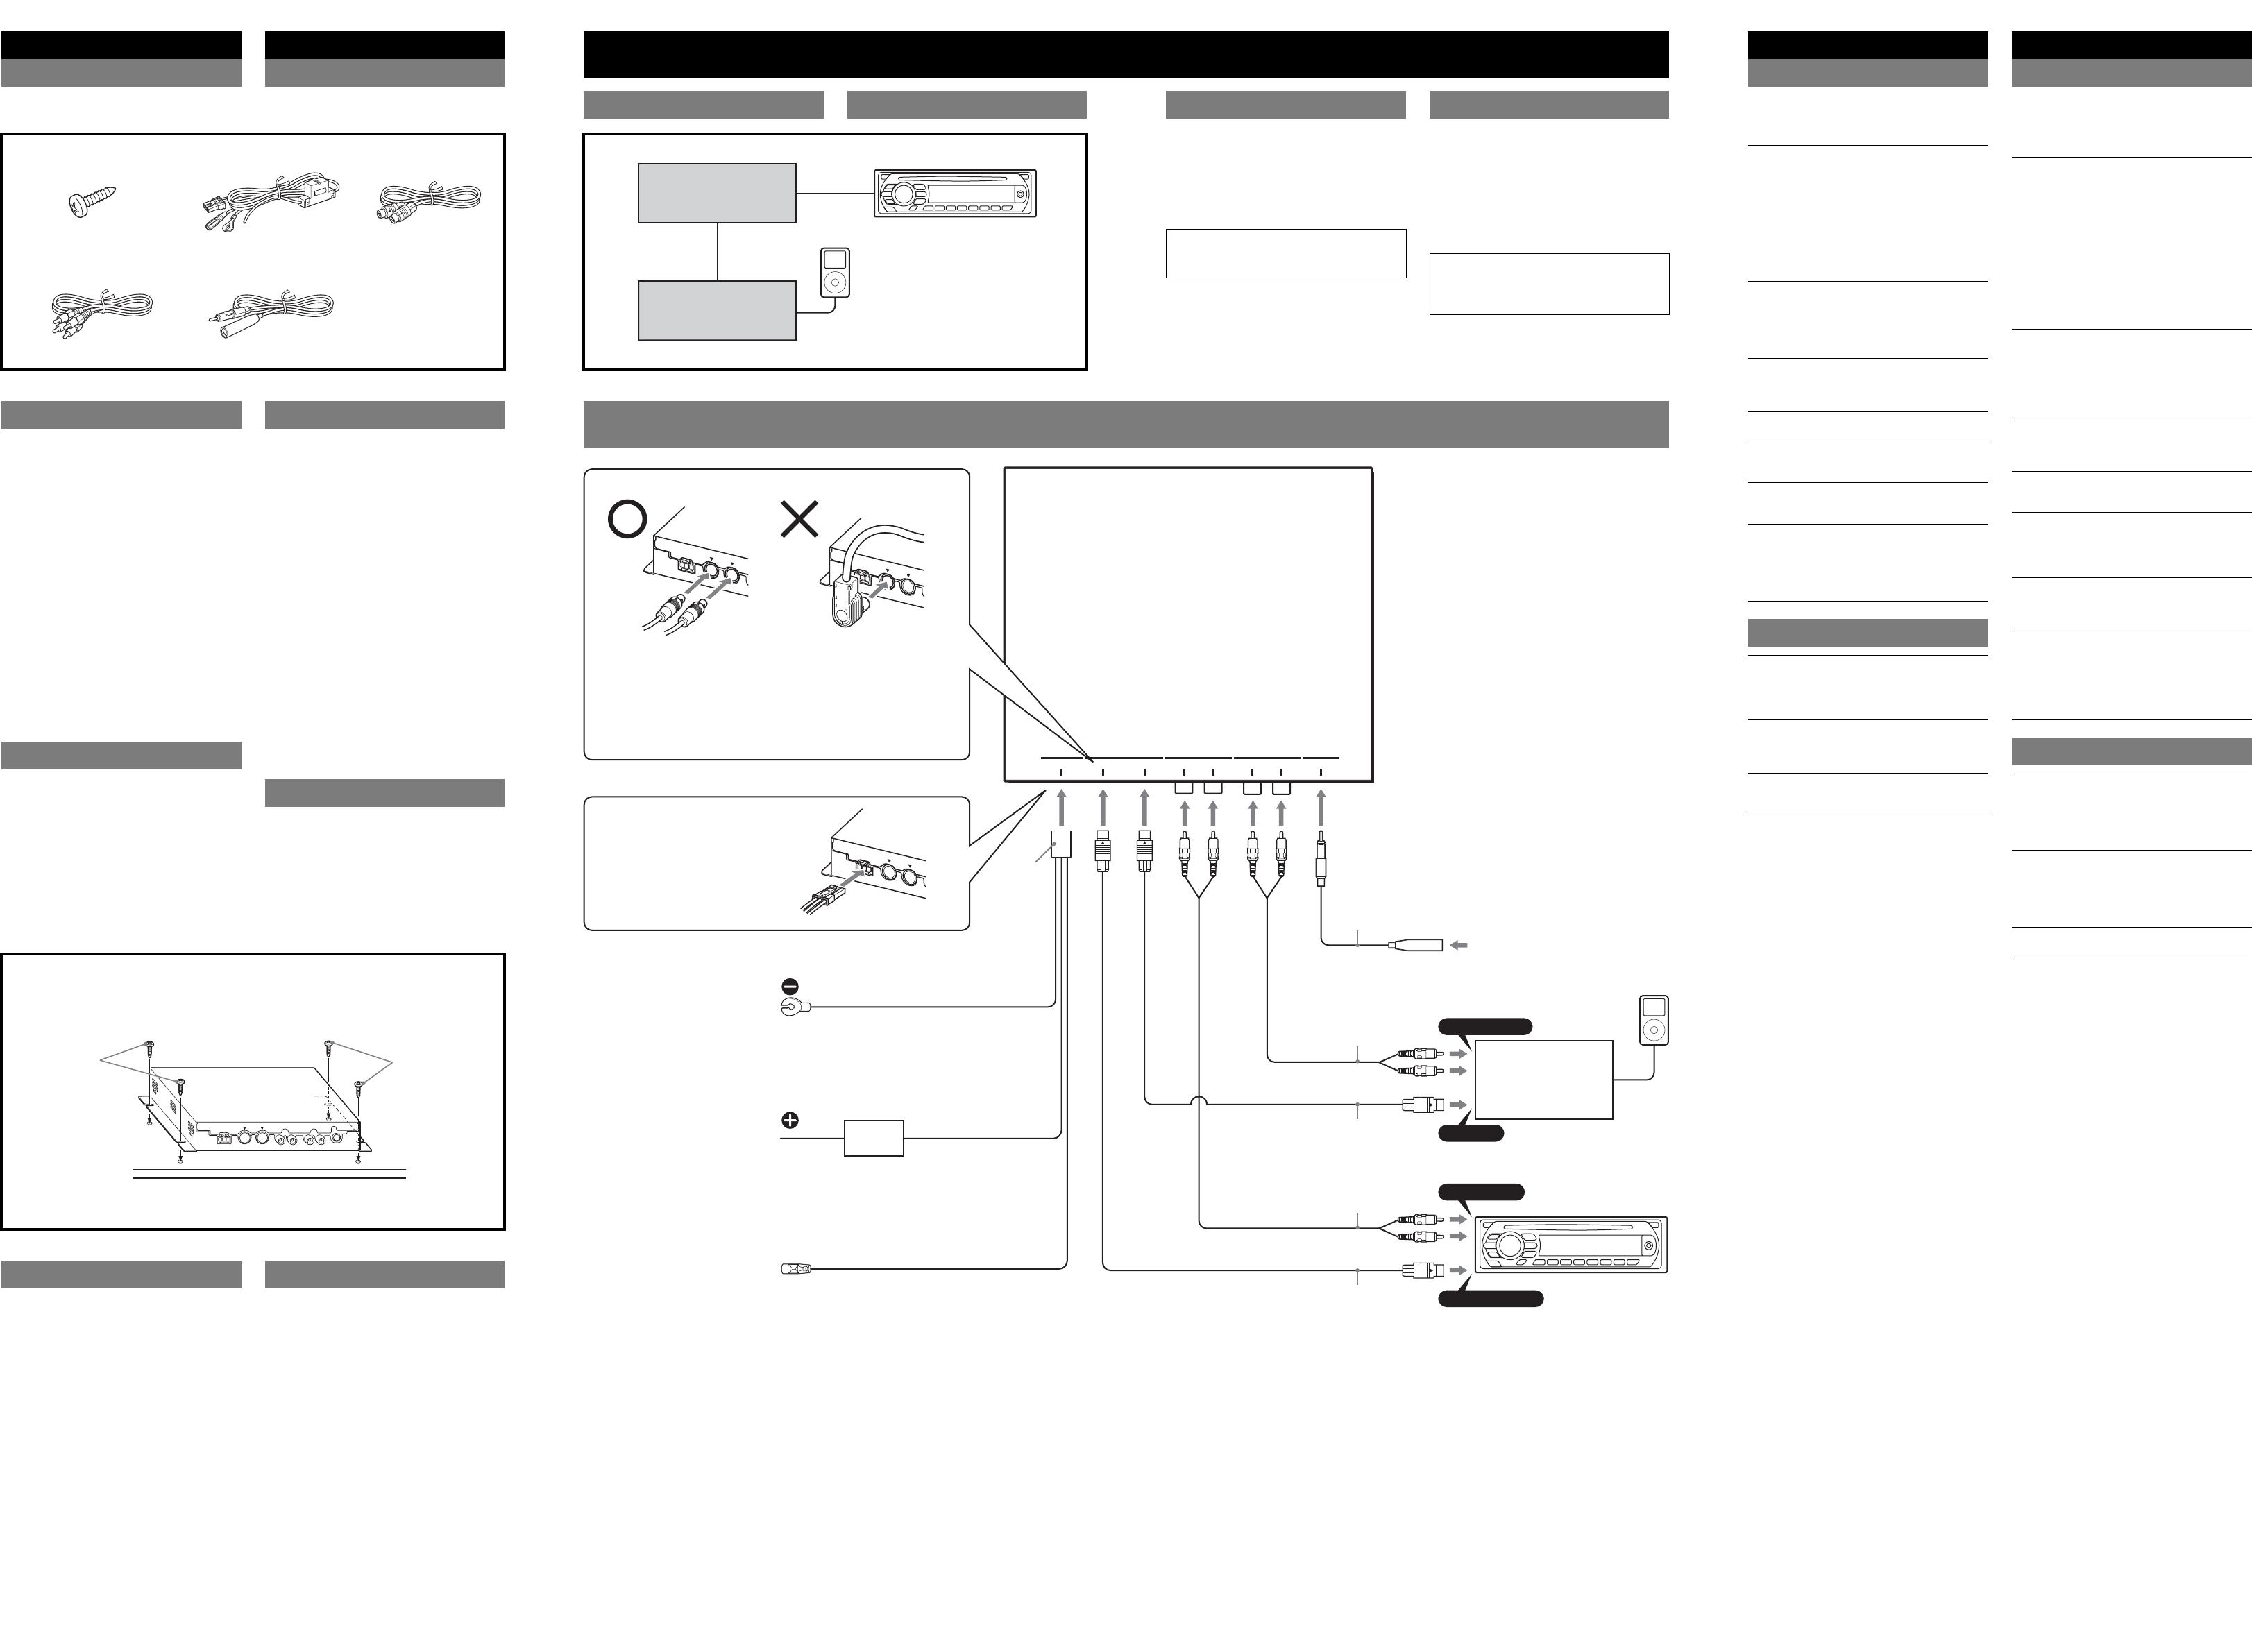 Sony Xt 100Hd Users Manual Sony Cdx Gt Wiring Harness on sony cdx-gt710 wiring, sony wiring diagrams, sony cdx-f50m, sony cdx-gt540ui, sony cdx-gt300, sony 52wx4 wire diagram,